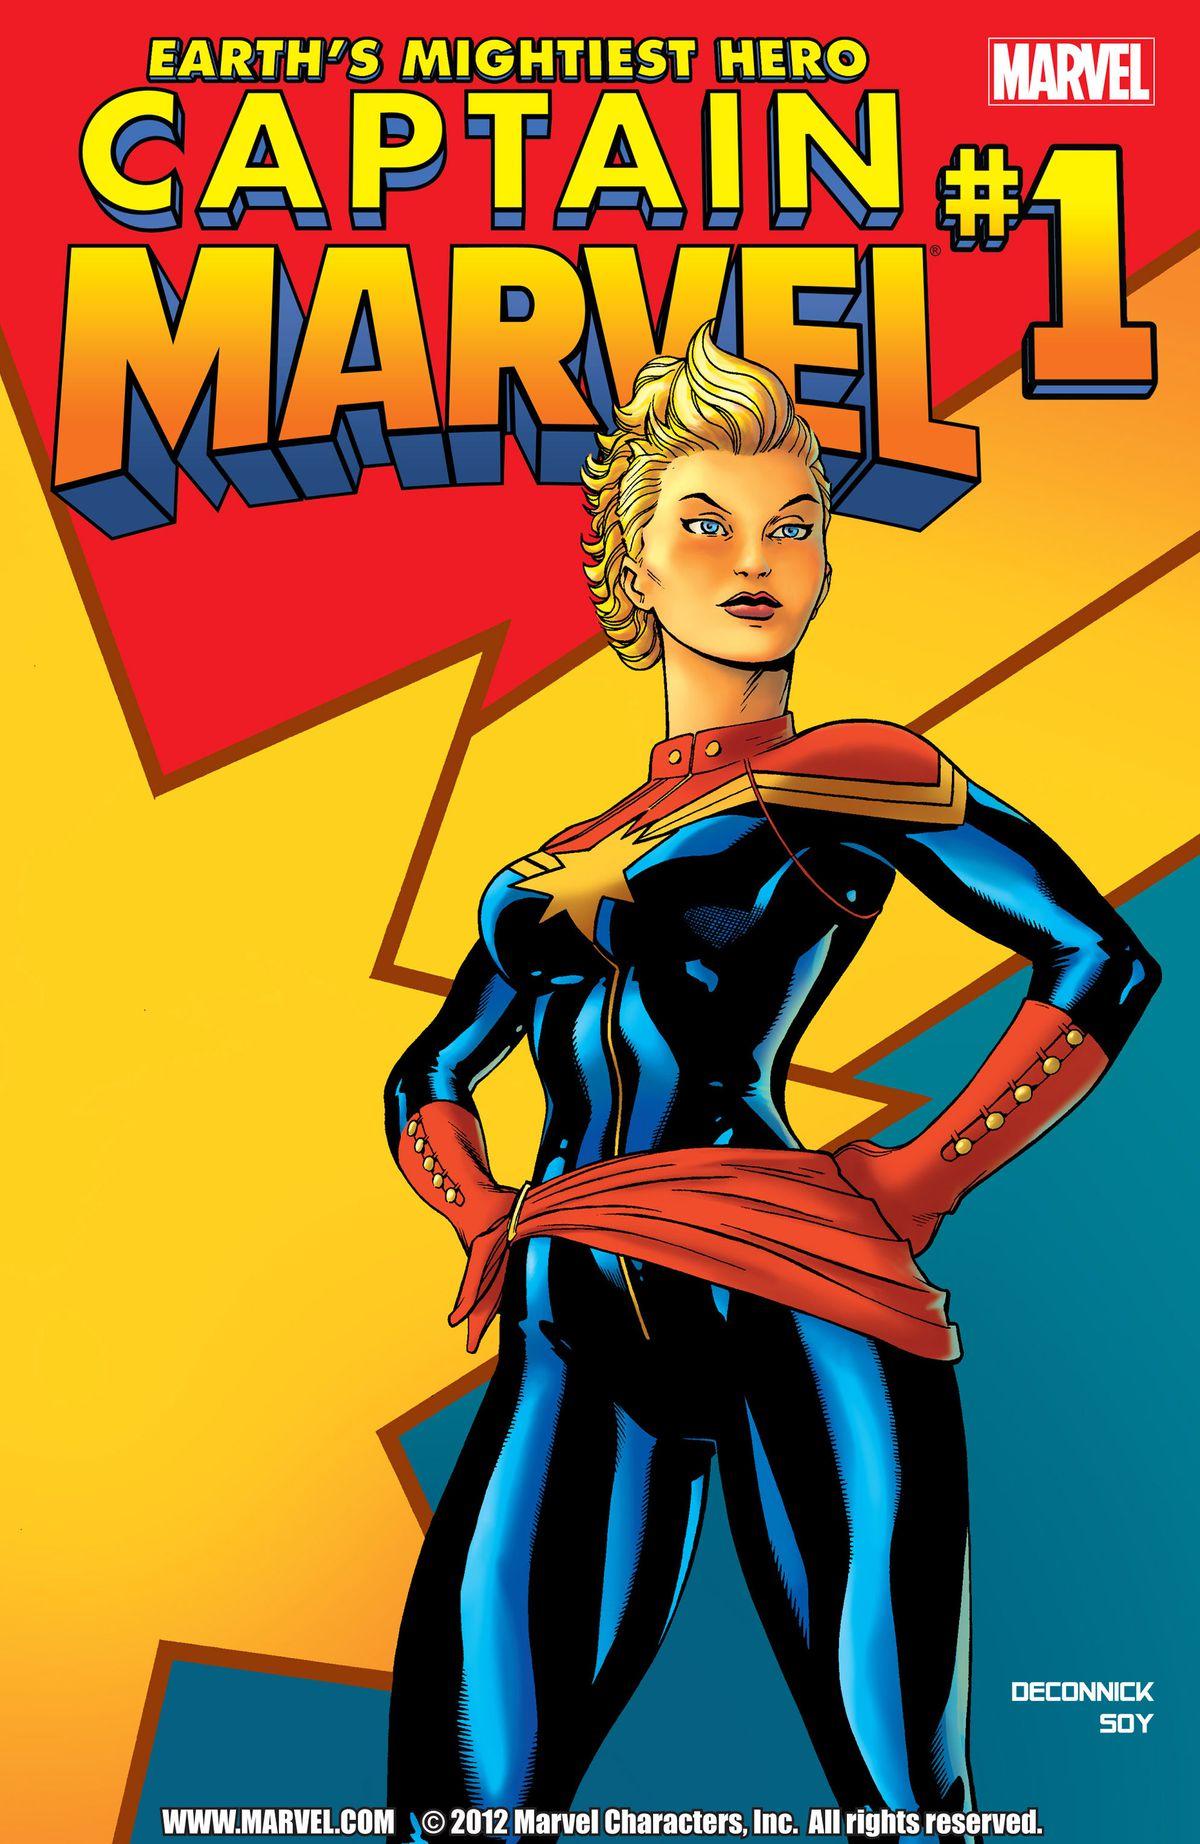 Carol Danvers as Captain Marvel on the cover of Captain Marvel #1, Marvel Comics (2012).